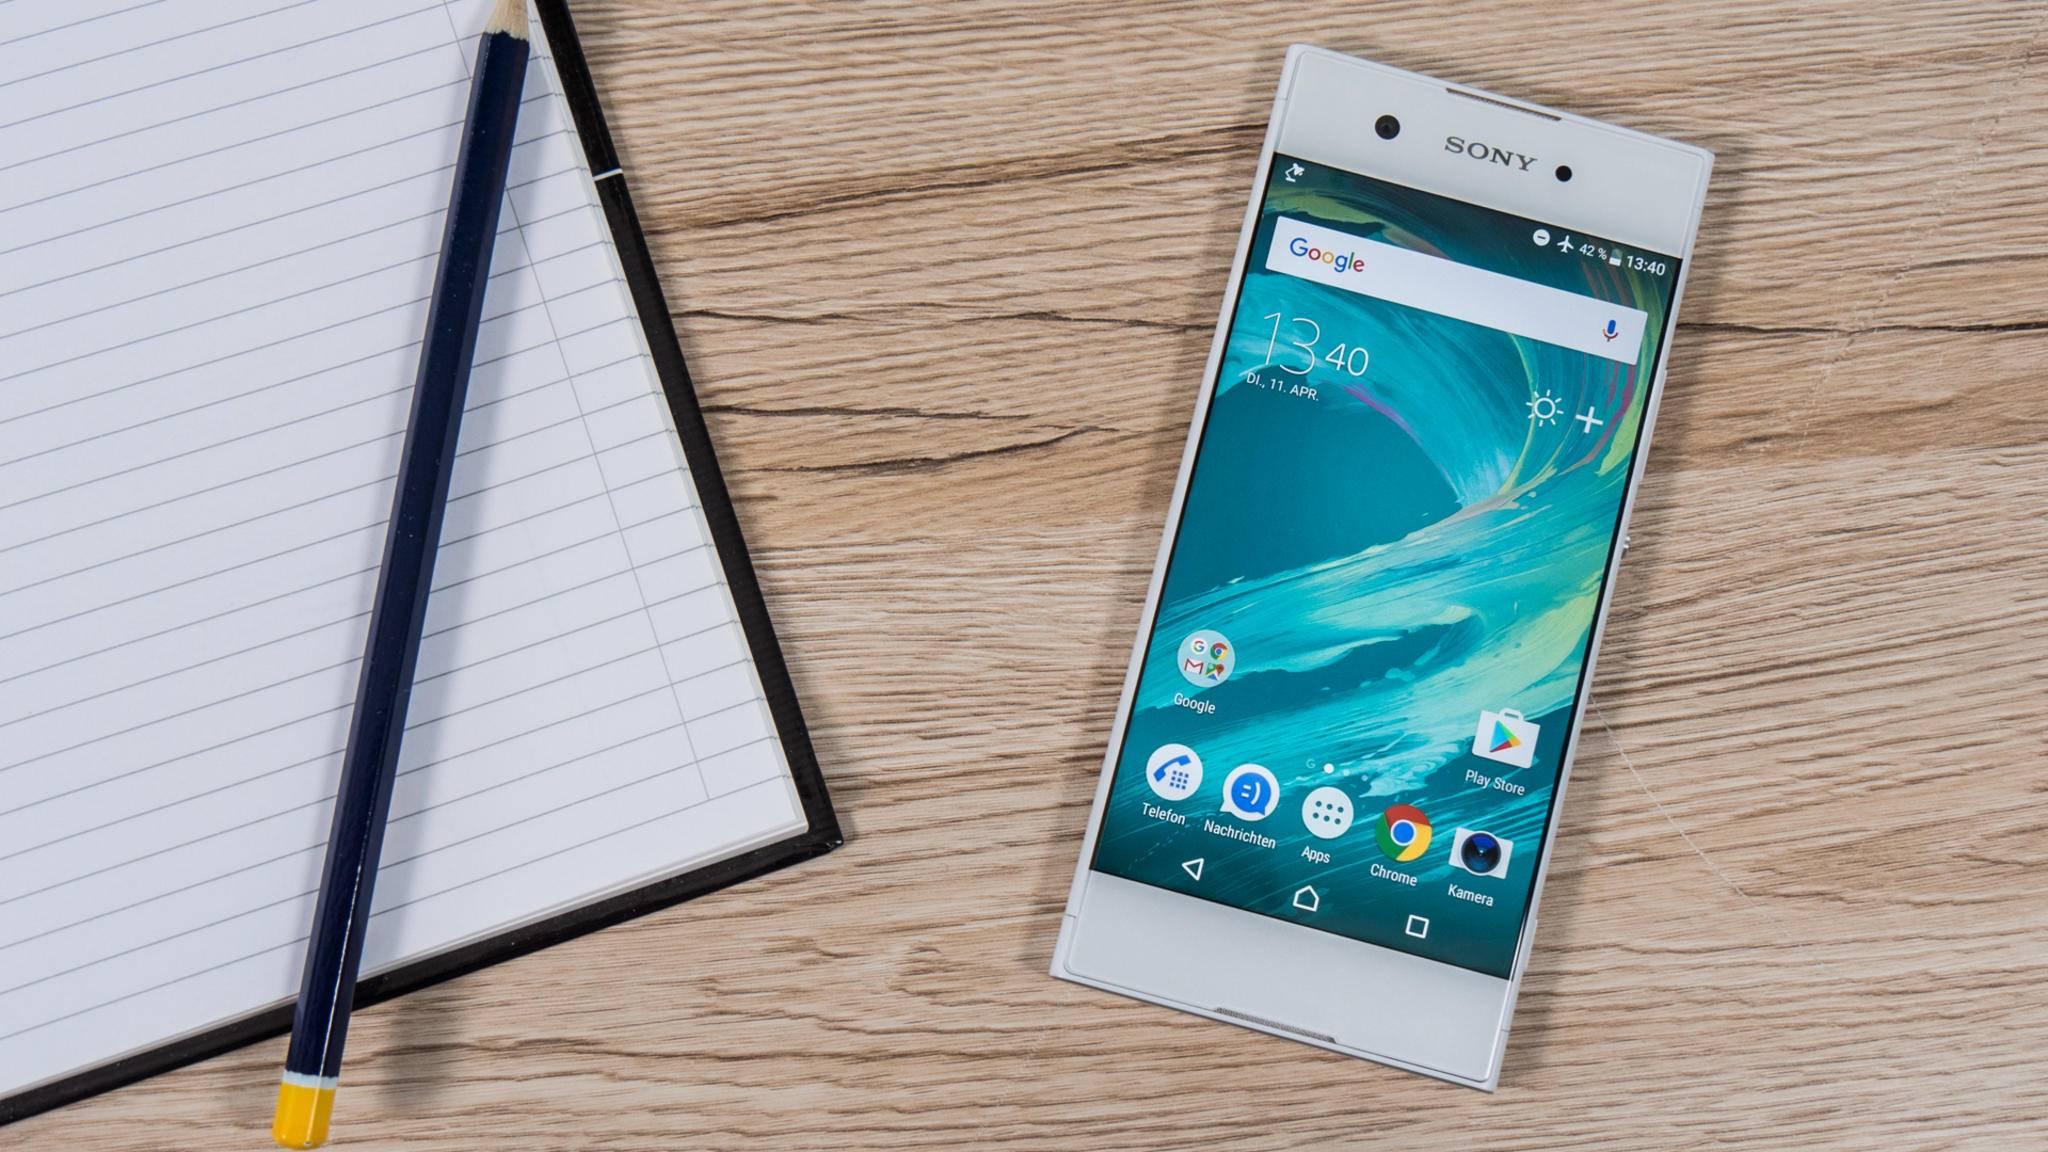 Bekommt dank Android 8.0 Oreo neue Features: Das Sony Xperia XA1.